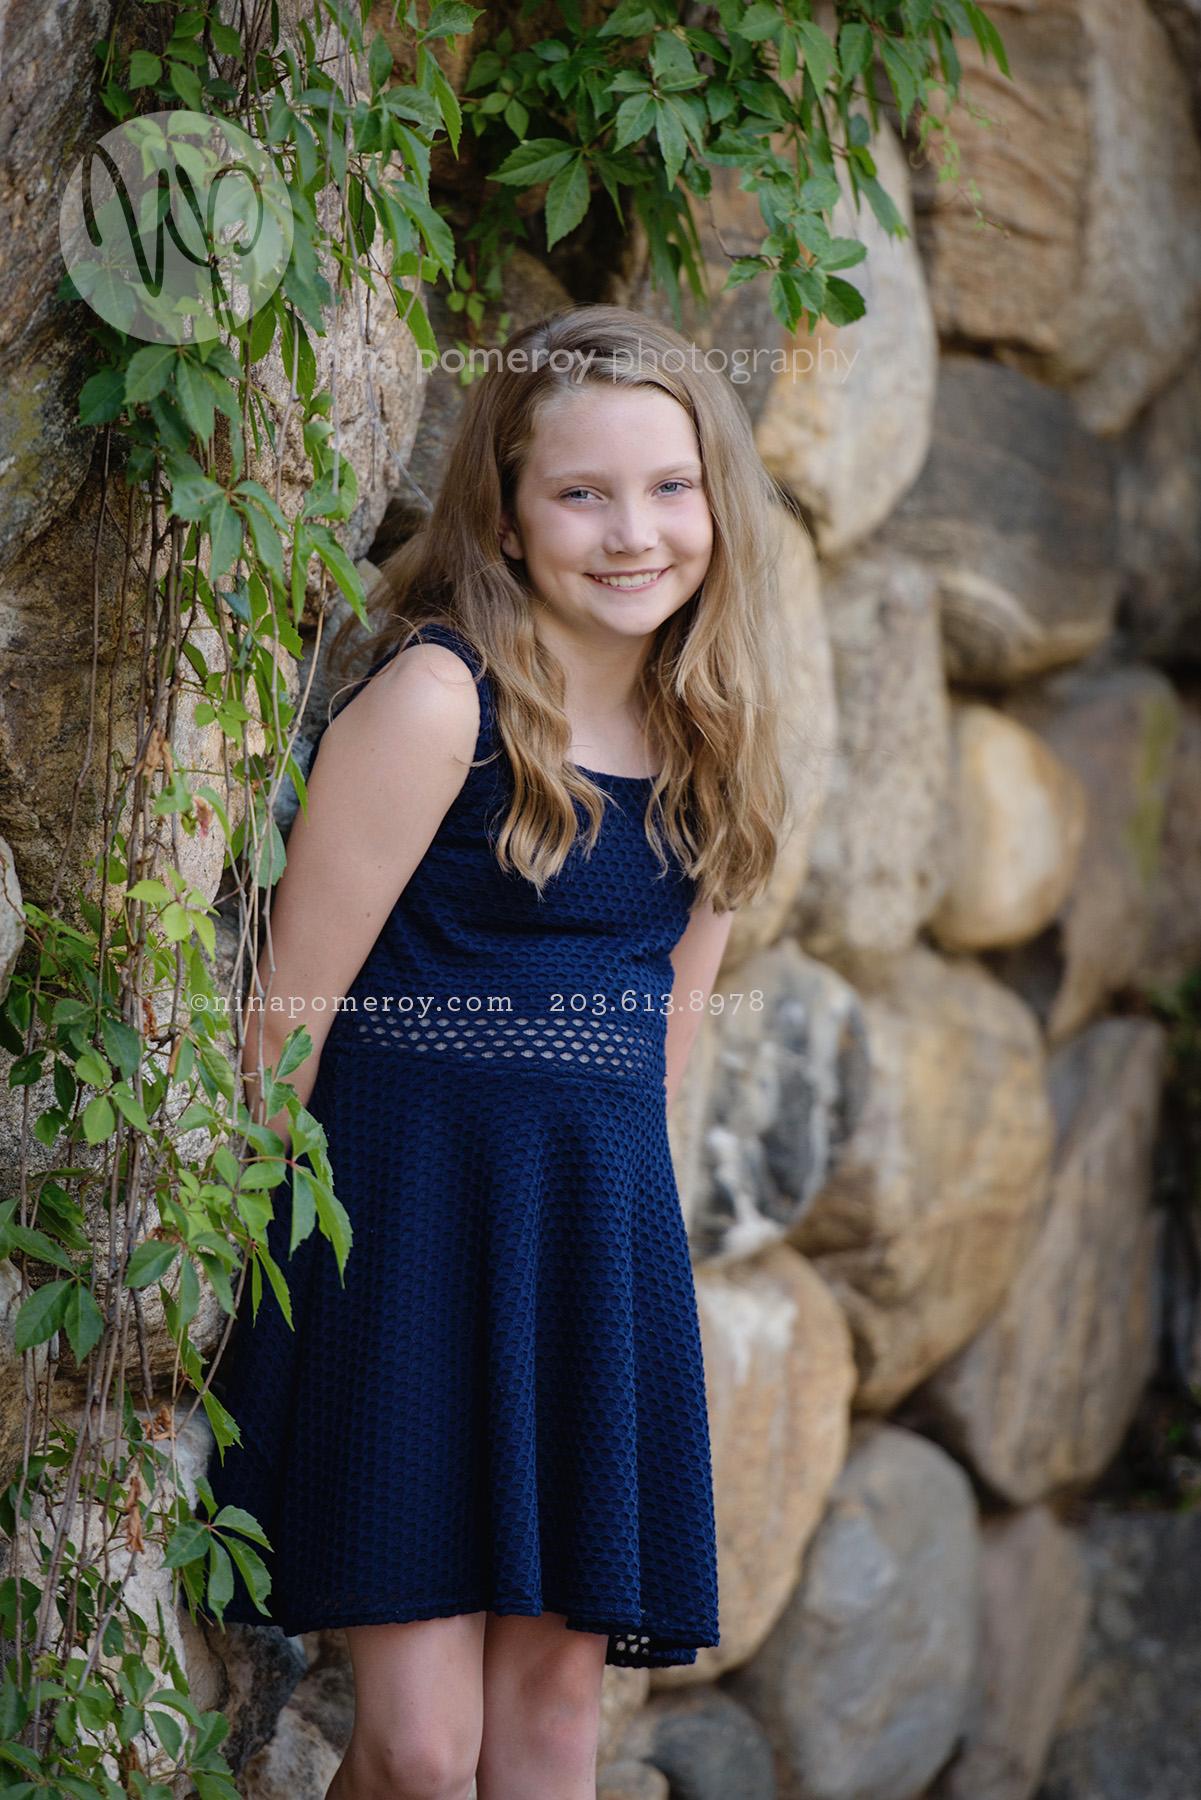 Tween teen girl portrait by rock wall and ivy wearing a blue dress taken by bay area photographer Nina Pomeroy.